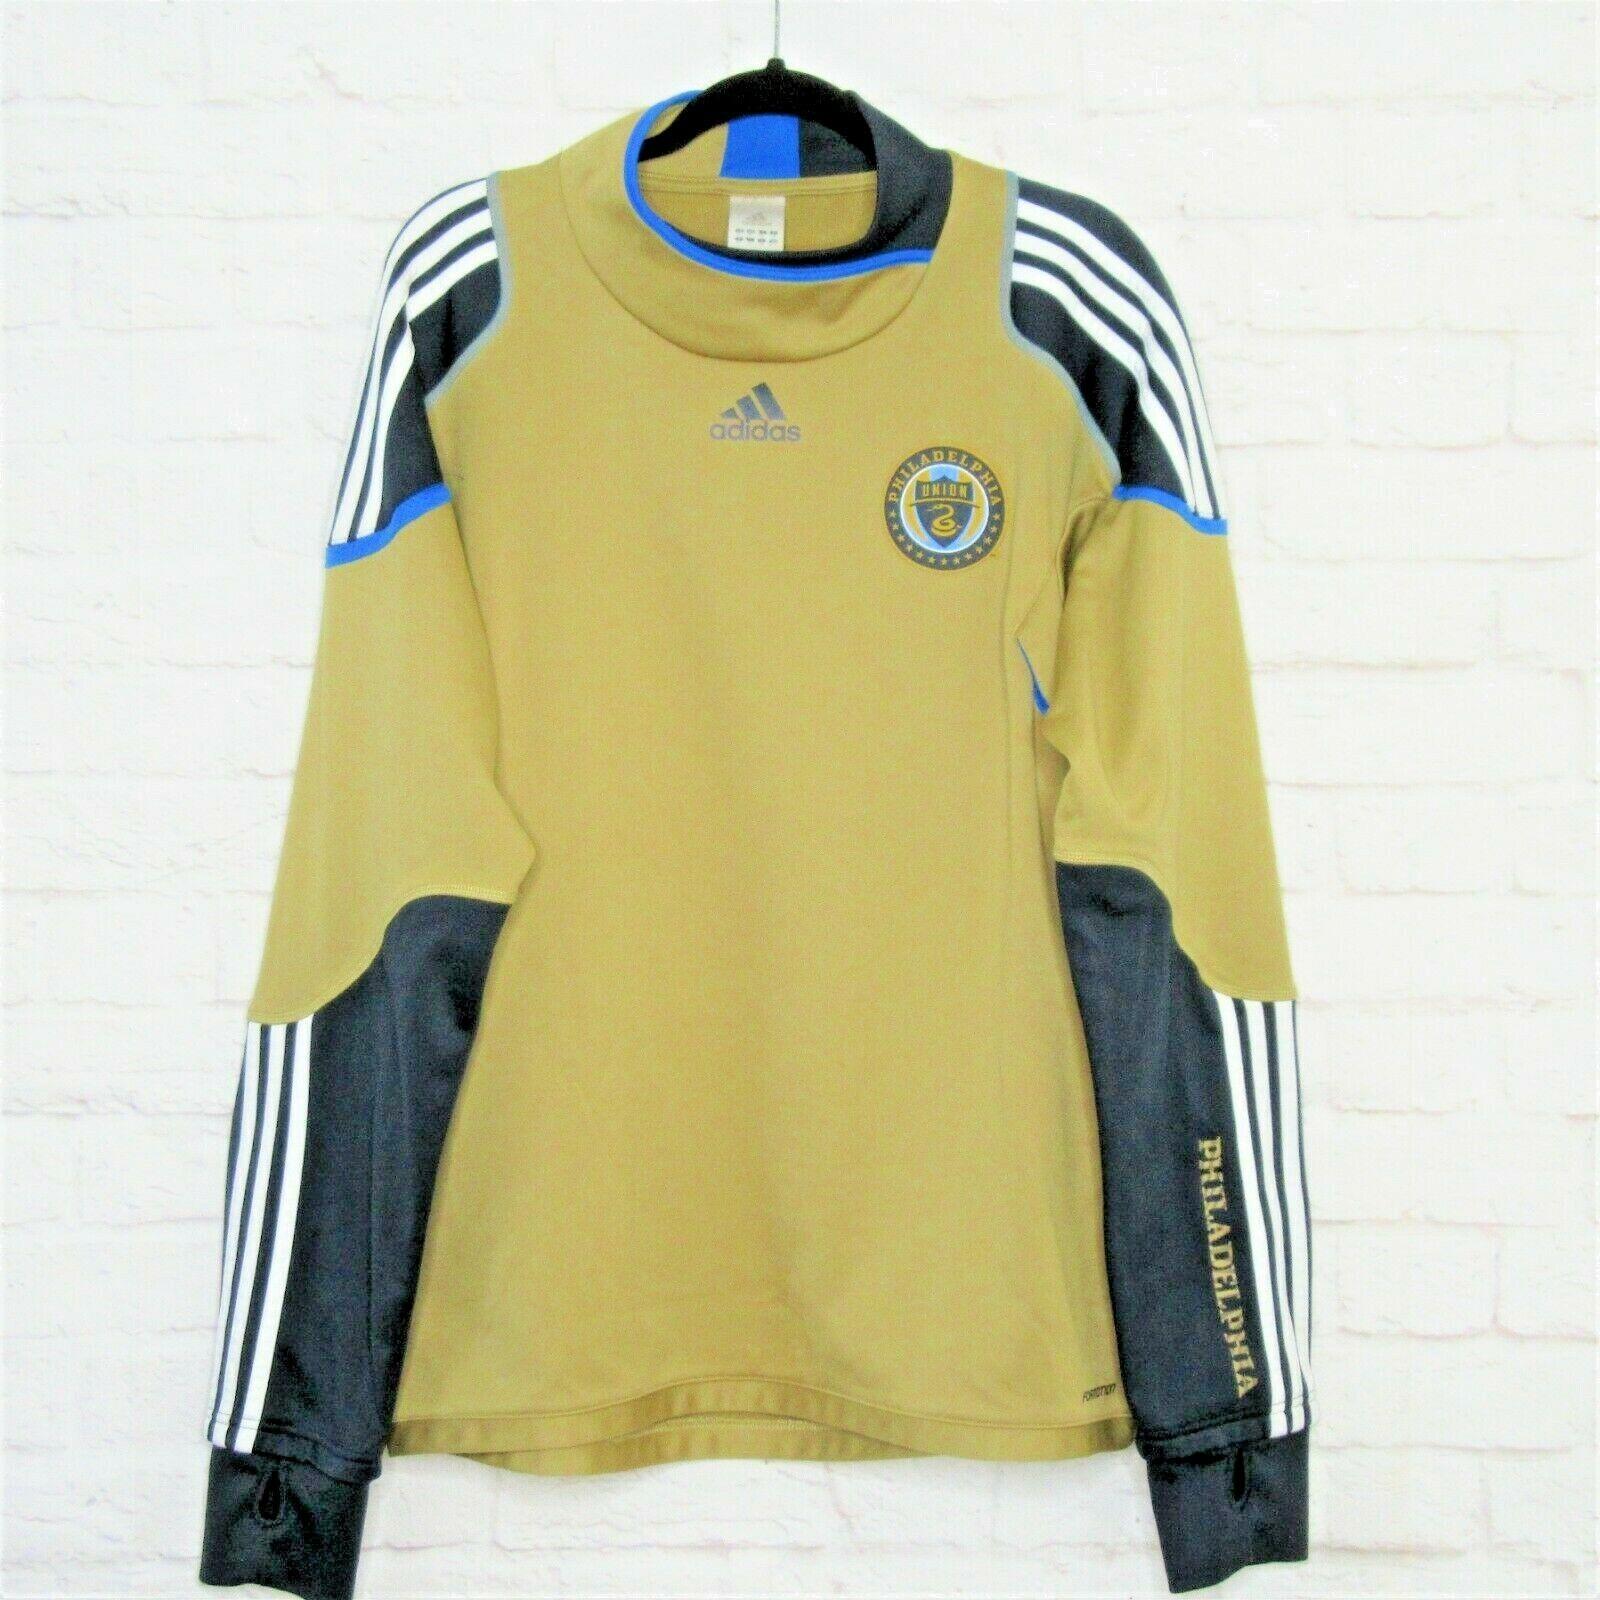 premium selection 7e315 10af0 adidas Philadelphia Union Soccer Training Formotion Sweat Shirt-jersey Top  Sz XL for sale online | eBay